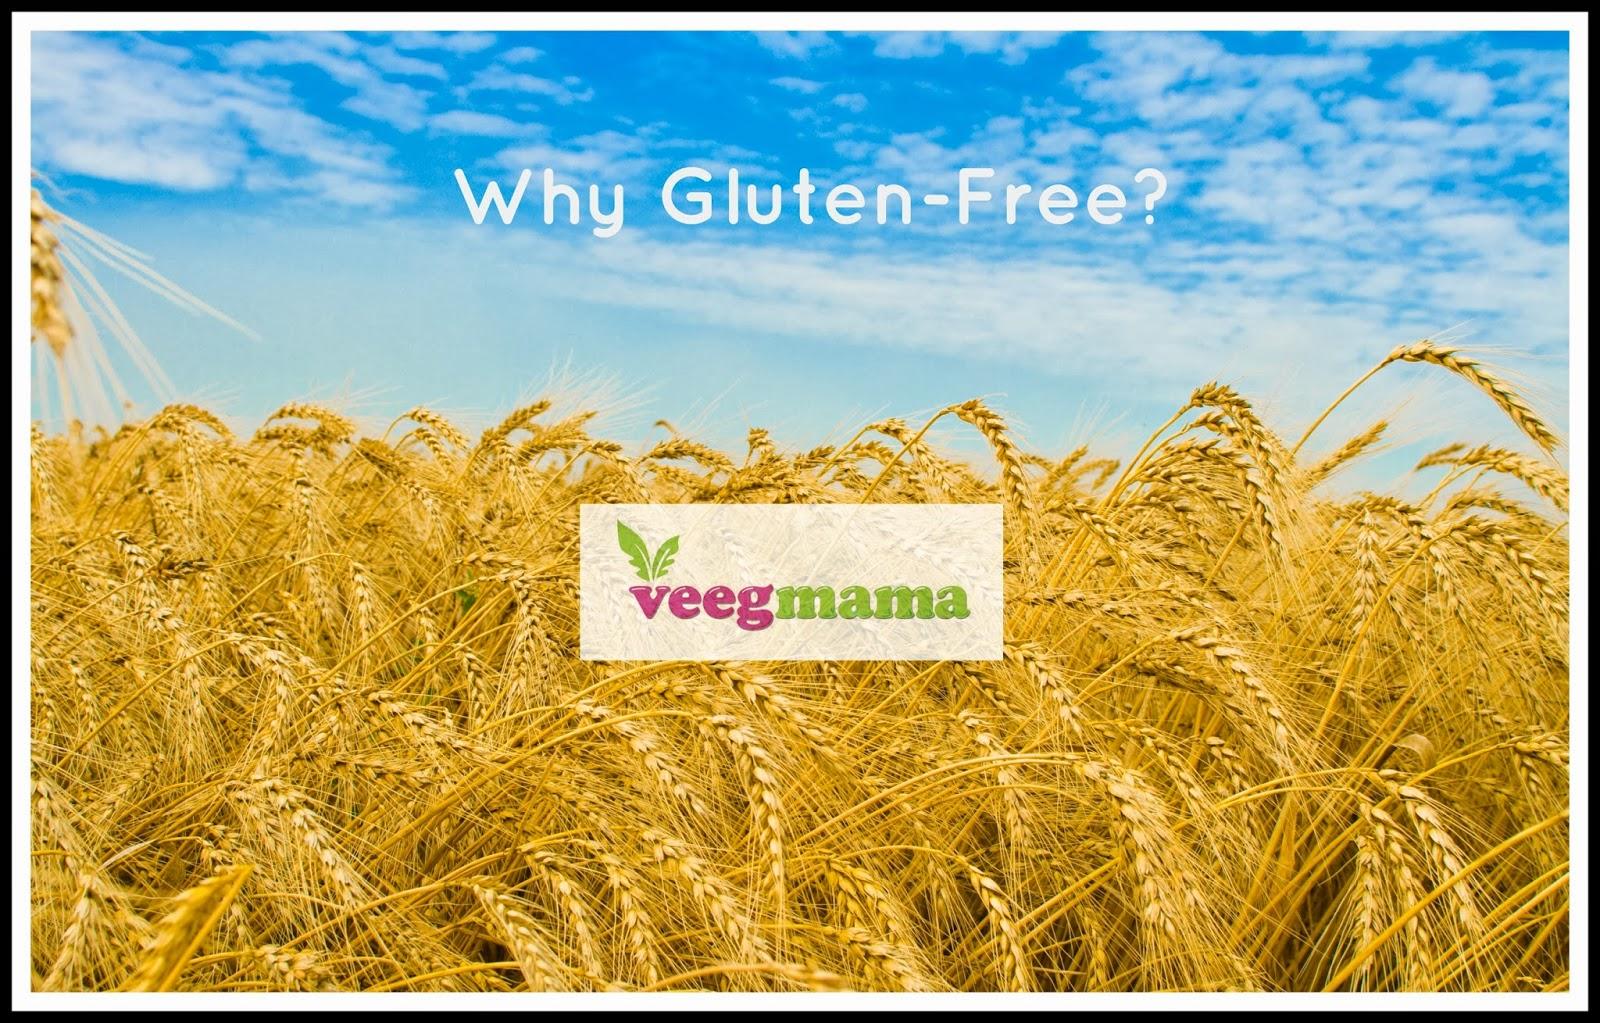 VeegMama's Gluten Free Q&A